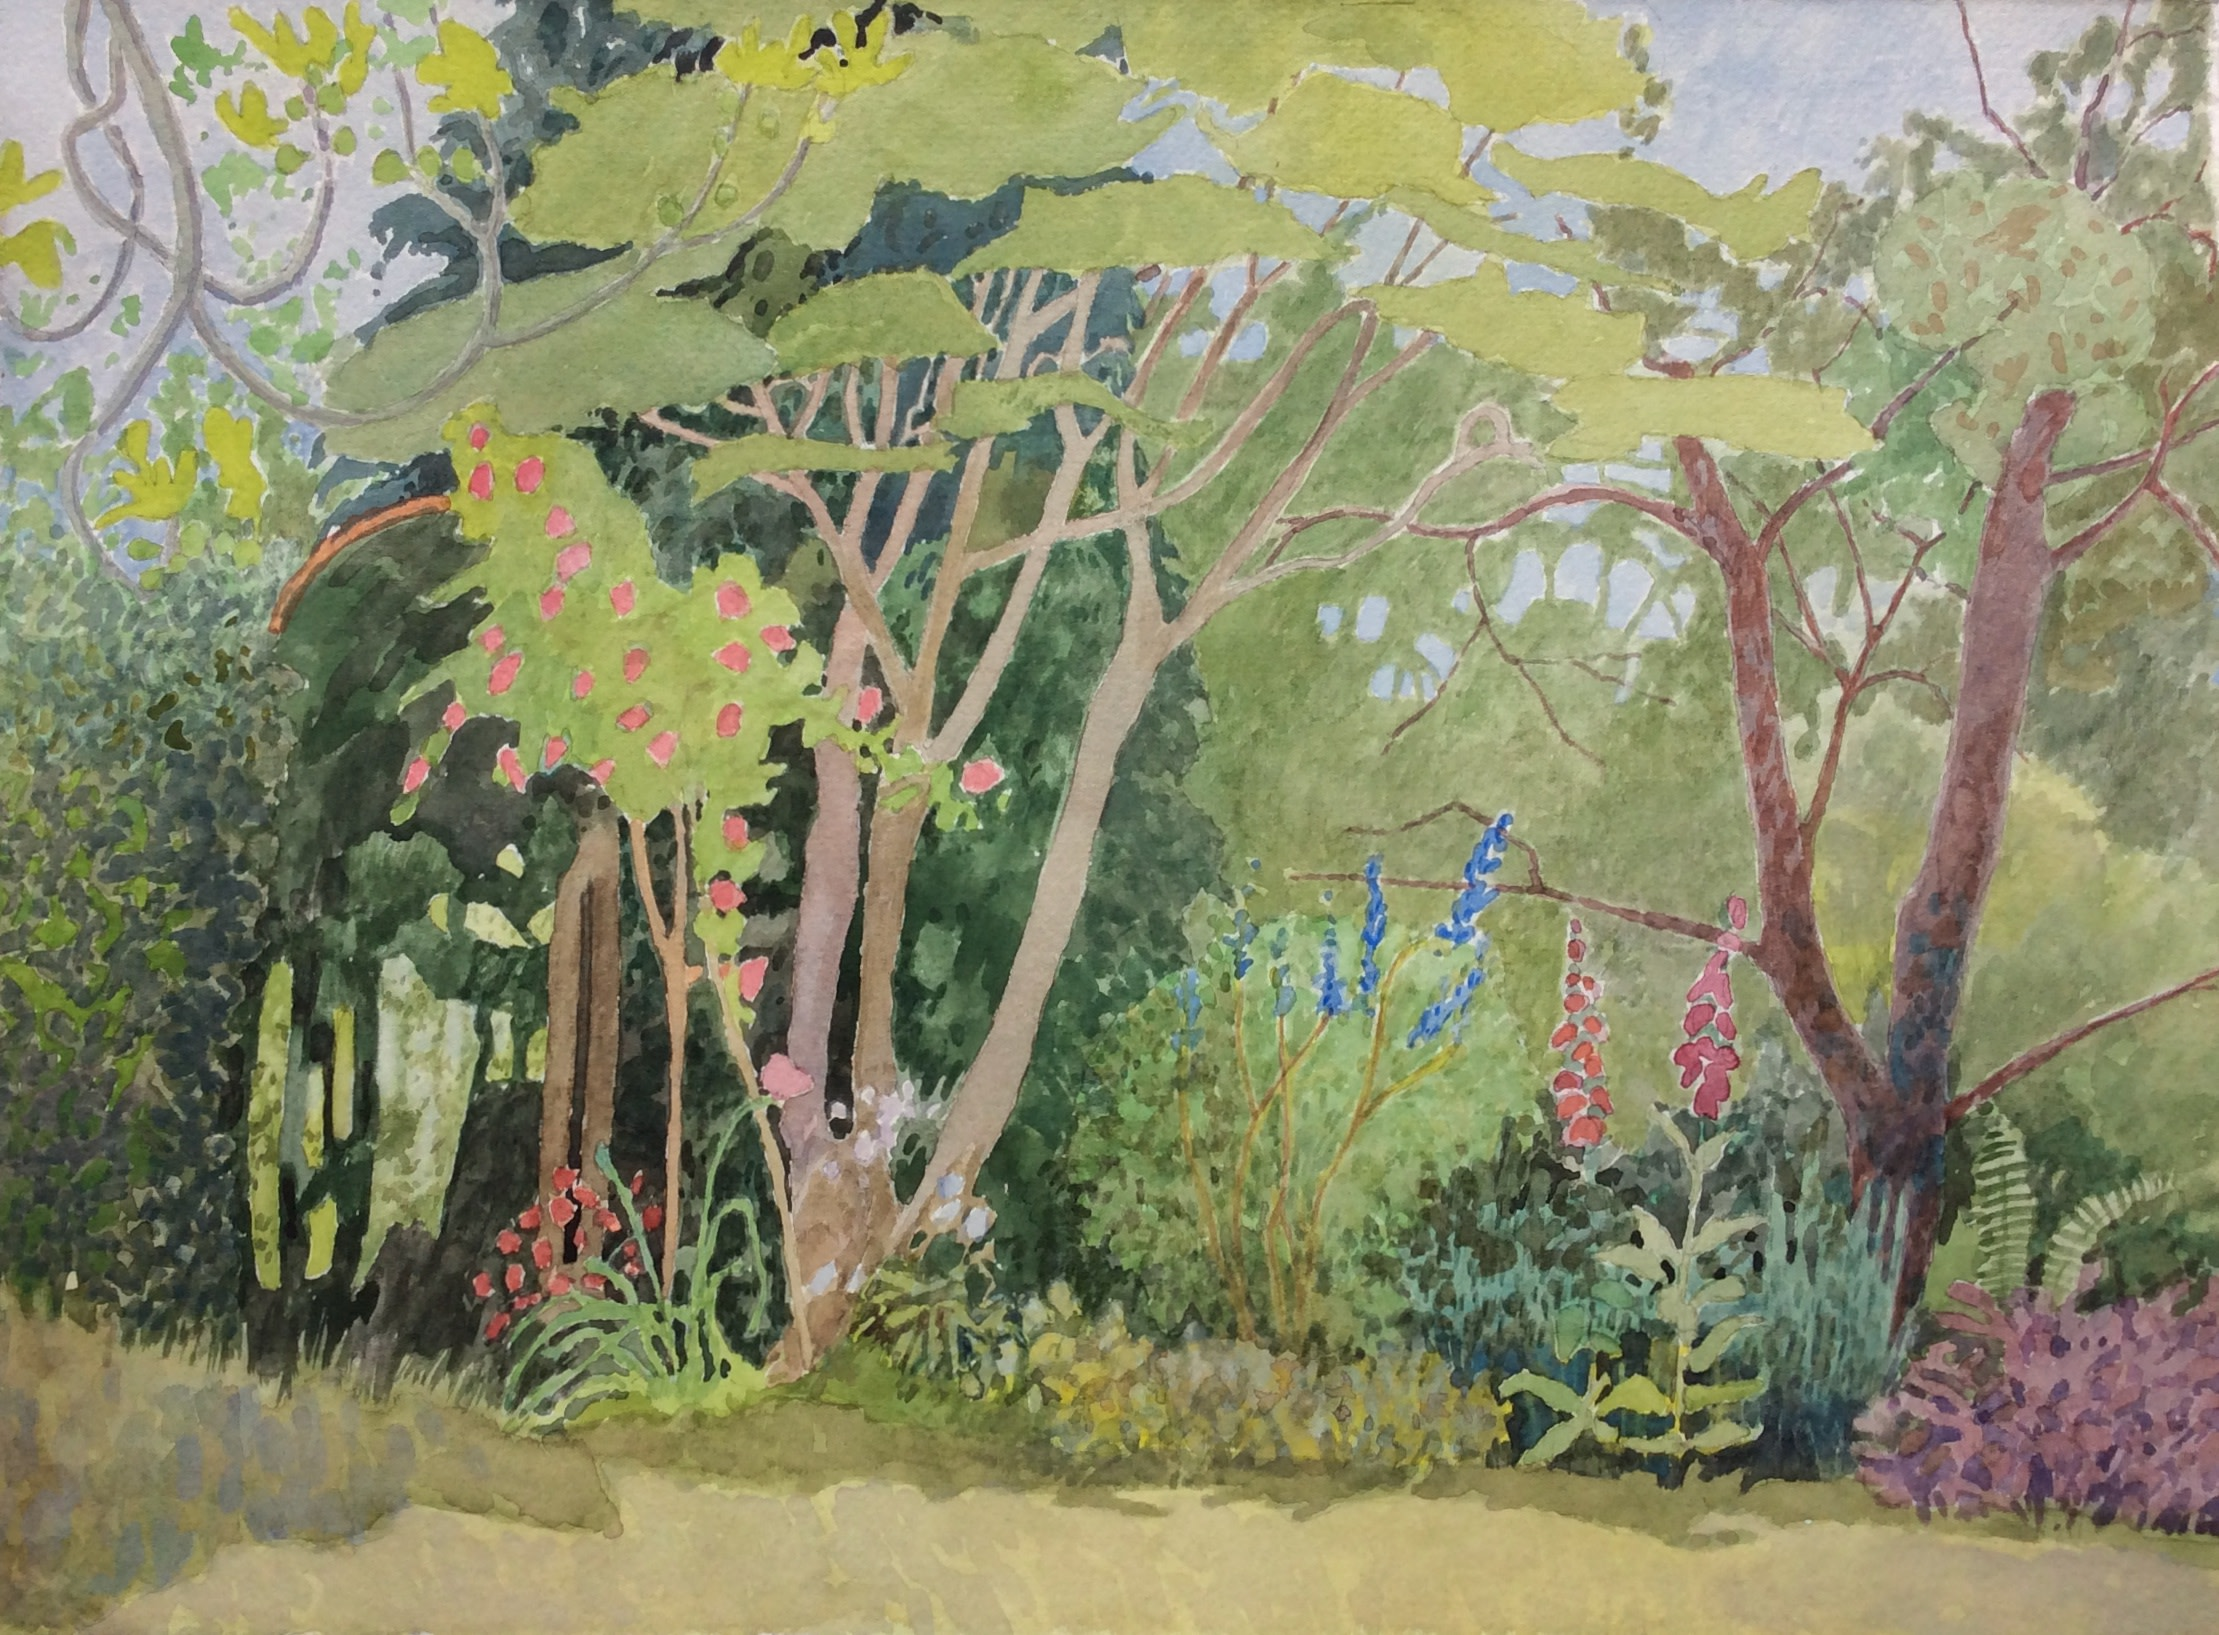 "<span class=""link fancybox-details-link""><a href=""/artists/109-annie-williams/works/12616-annie-williams-lockdown-garden/"">View Detail Page</a></span><div class=""artist""><span class=""artist""><strong>Annie Williams</strong></span></div><div class=""title""><em>Lockdown Garden</em></div><div class=""medium"">watercolour</div><div class=""dimensions"">Artwork: 37 x 27cm</div><div class=""price"">£400.00</div>"